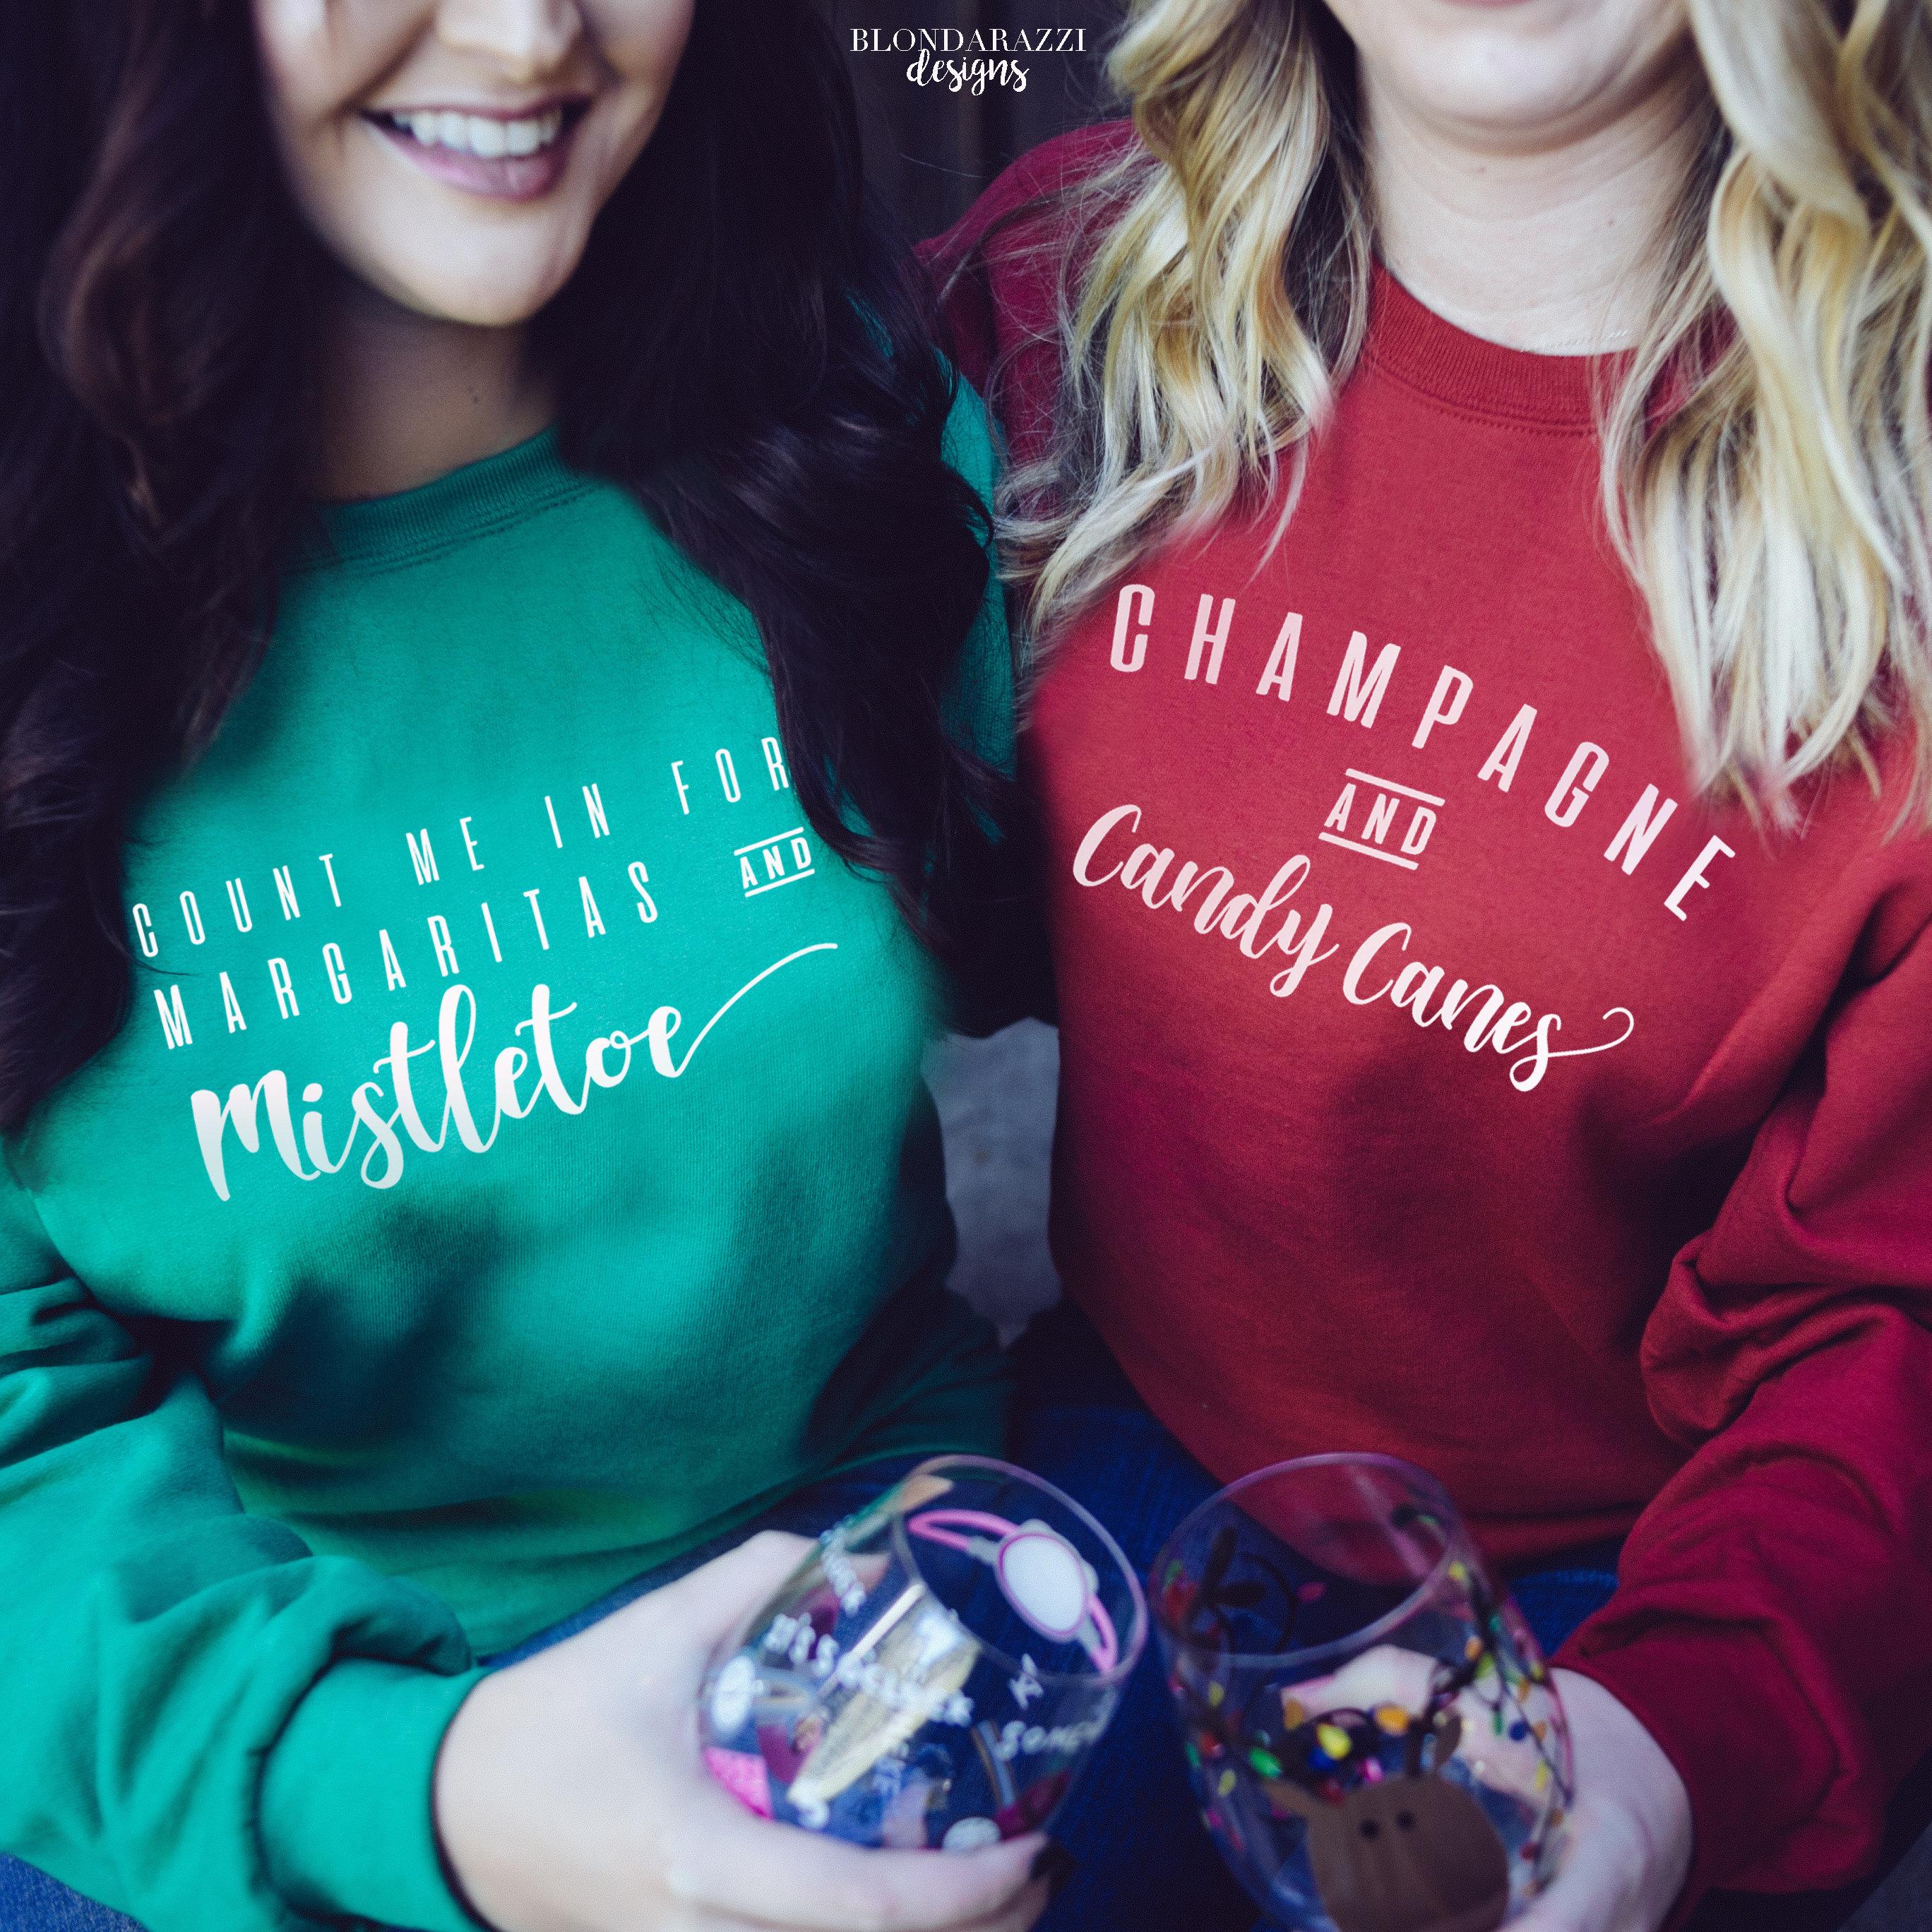 funny christmas sweatshirts champagne Candy canes margaritas mistletoe